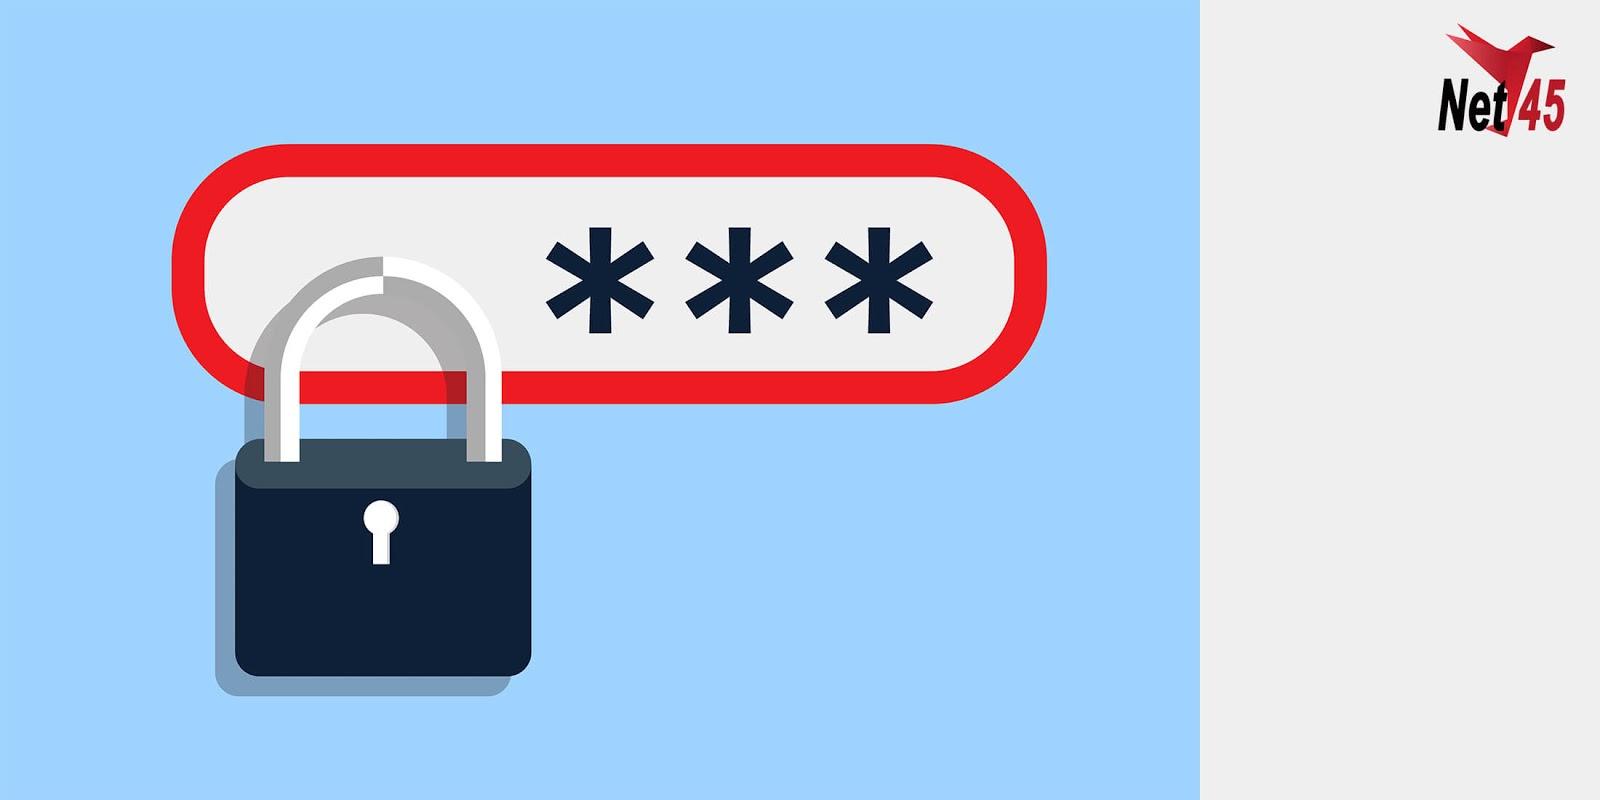 password,laptop,how to,reset,laptop password reset,reset password,how to reset forgotten laptop password,how to reset password on sony vaio laptop,how to reset a laptop,windows password reset,password reset,windows 10 password reset,how to clear bios password in acer laptop,how to remove bios password on acer laptop,how to remove bios password in acer laptop